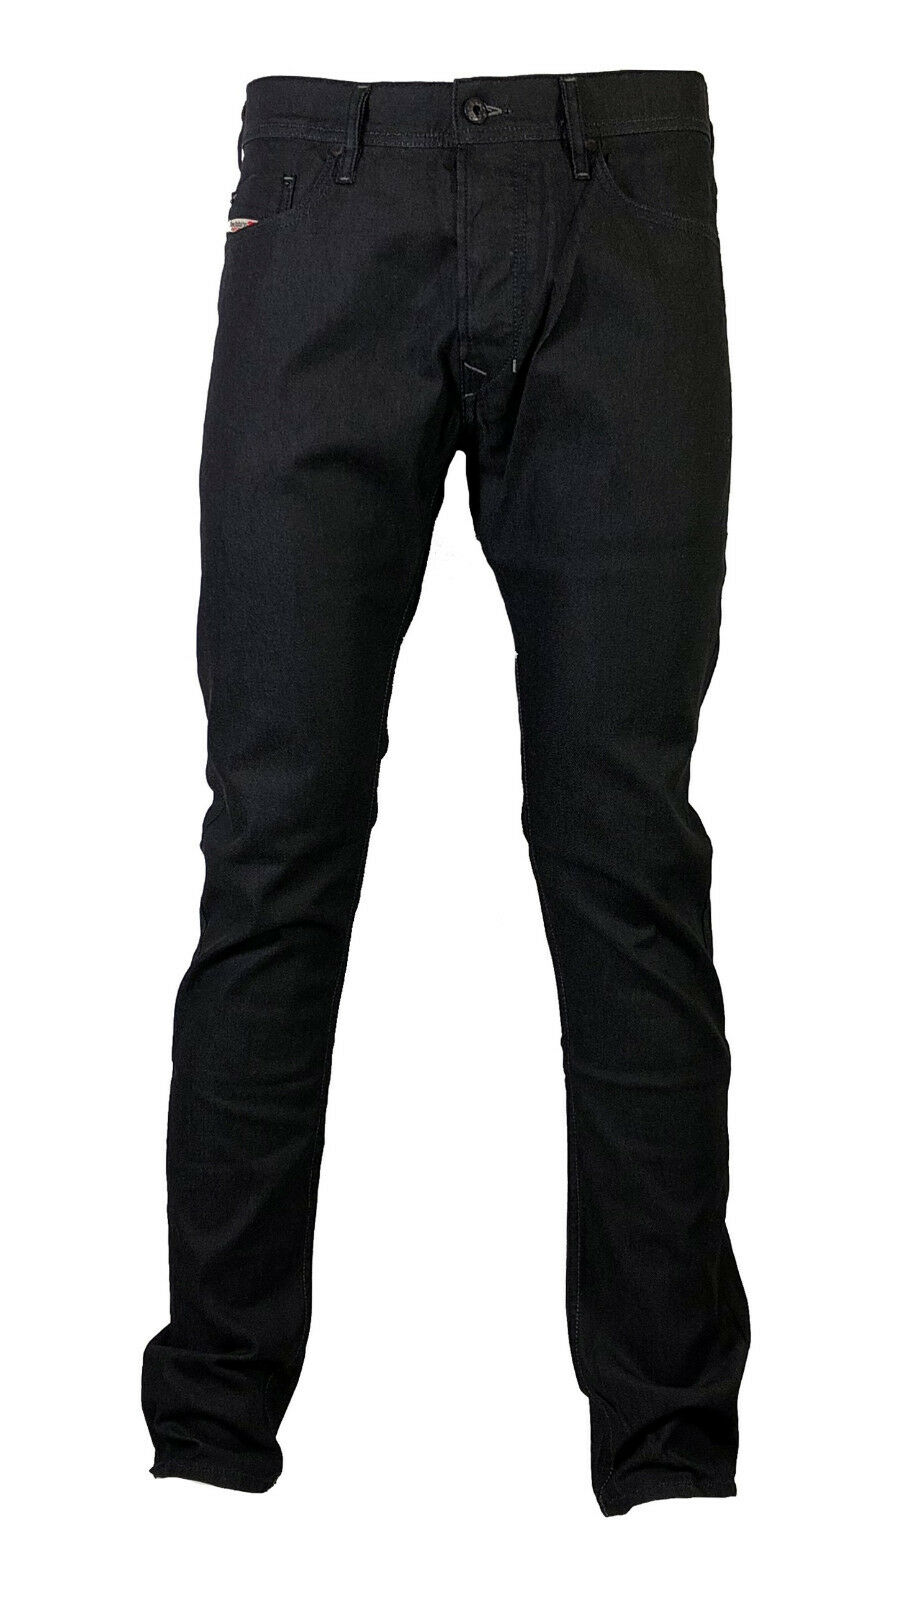 Diesel Herren Stretch Jeans TEPPHAR 0800W 800W dunkelblau Gr. 32 32 NEU